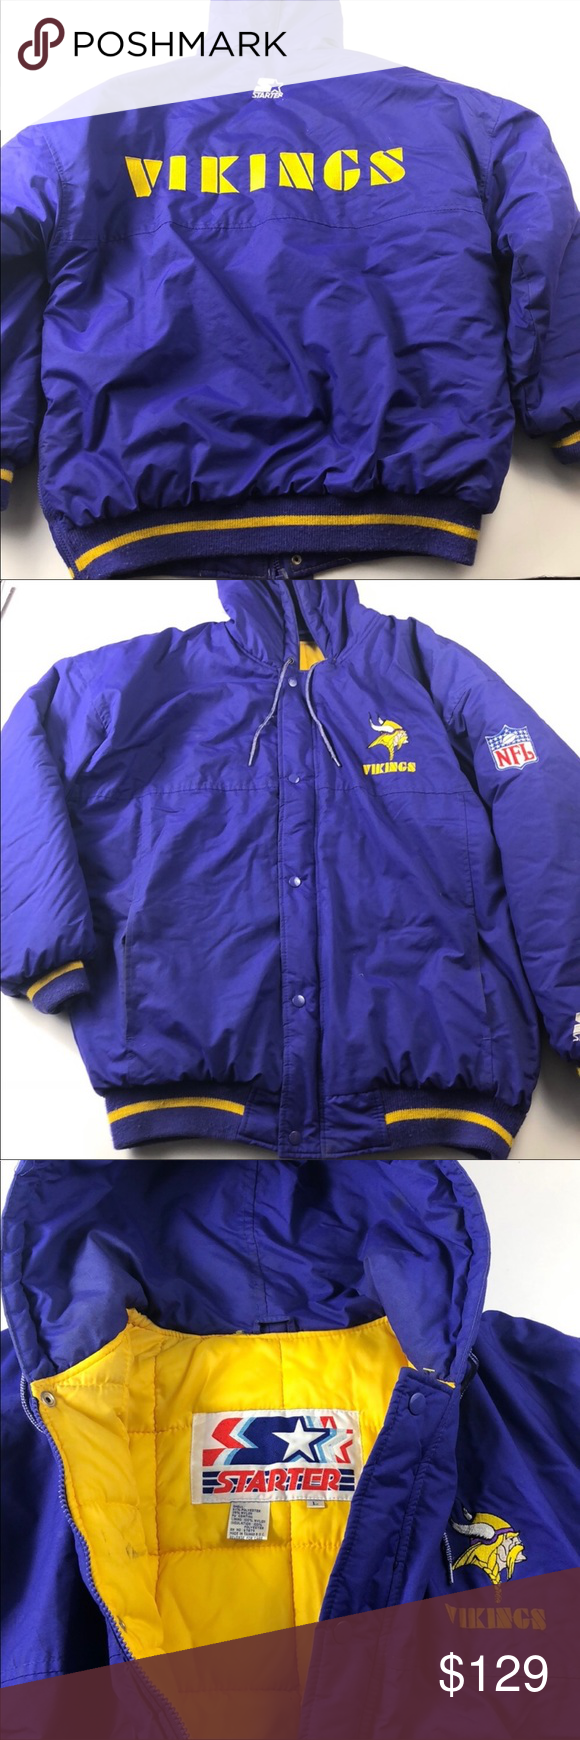 Starter Vintage Minnesota Vikings Winter Jacket Jackets Winter Jackets Clothes Design [ 1740 x 580 Pixel ]